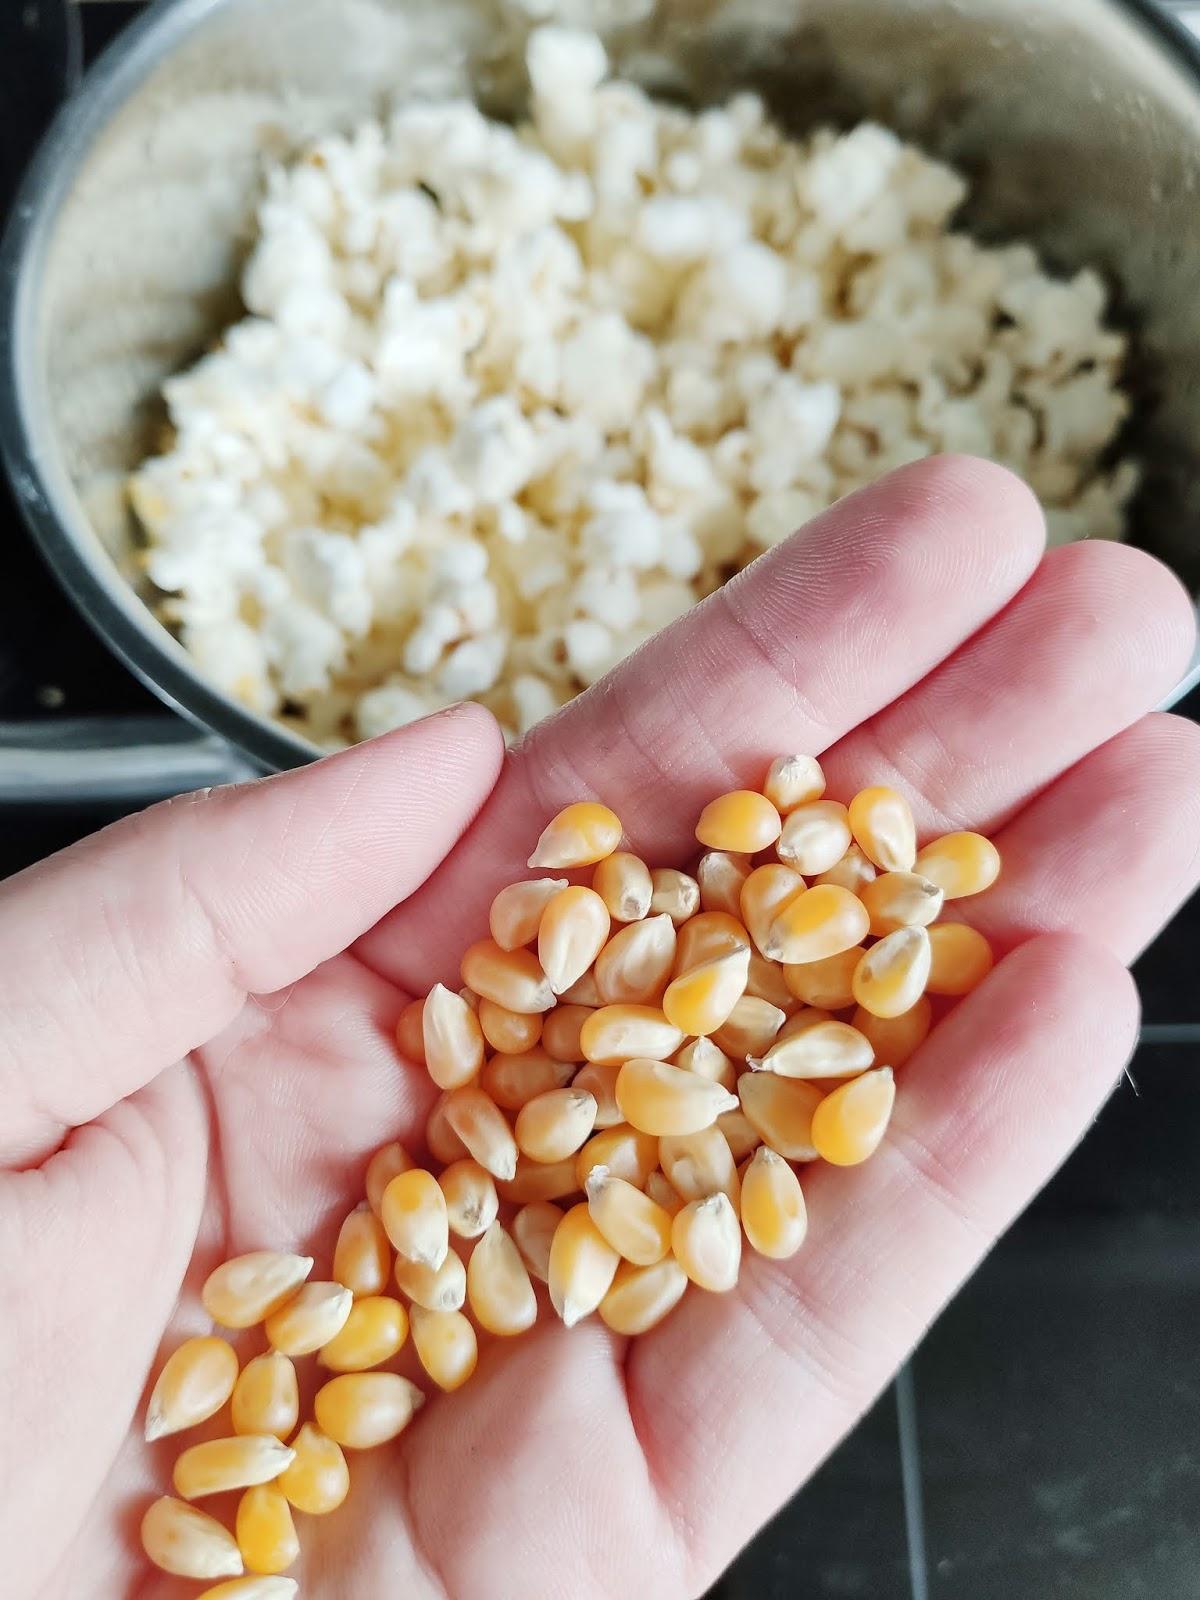 Salziges Popcorn Rezept | Party Food | Picknick Ideen | judetta.de